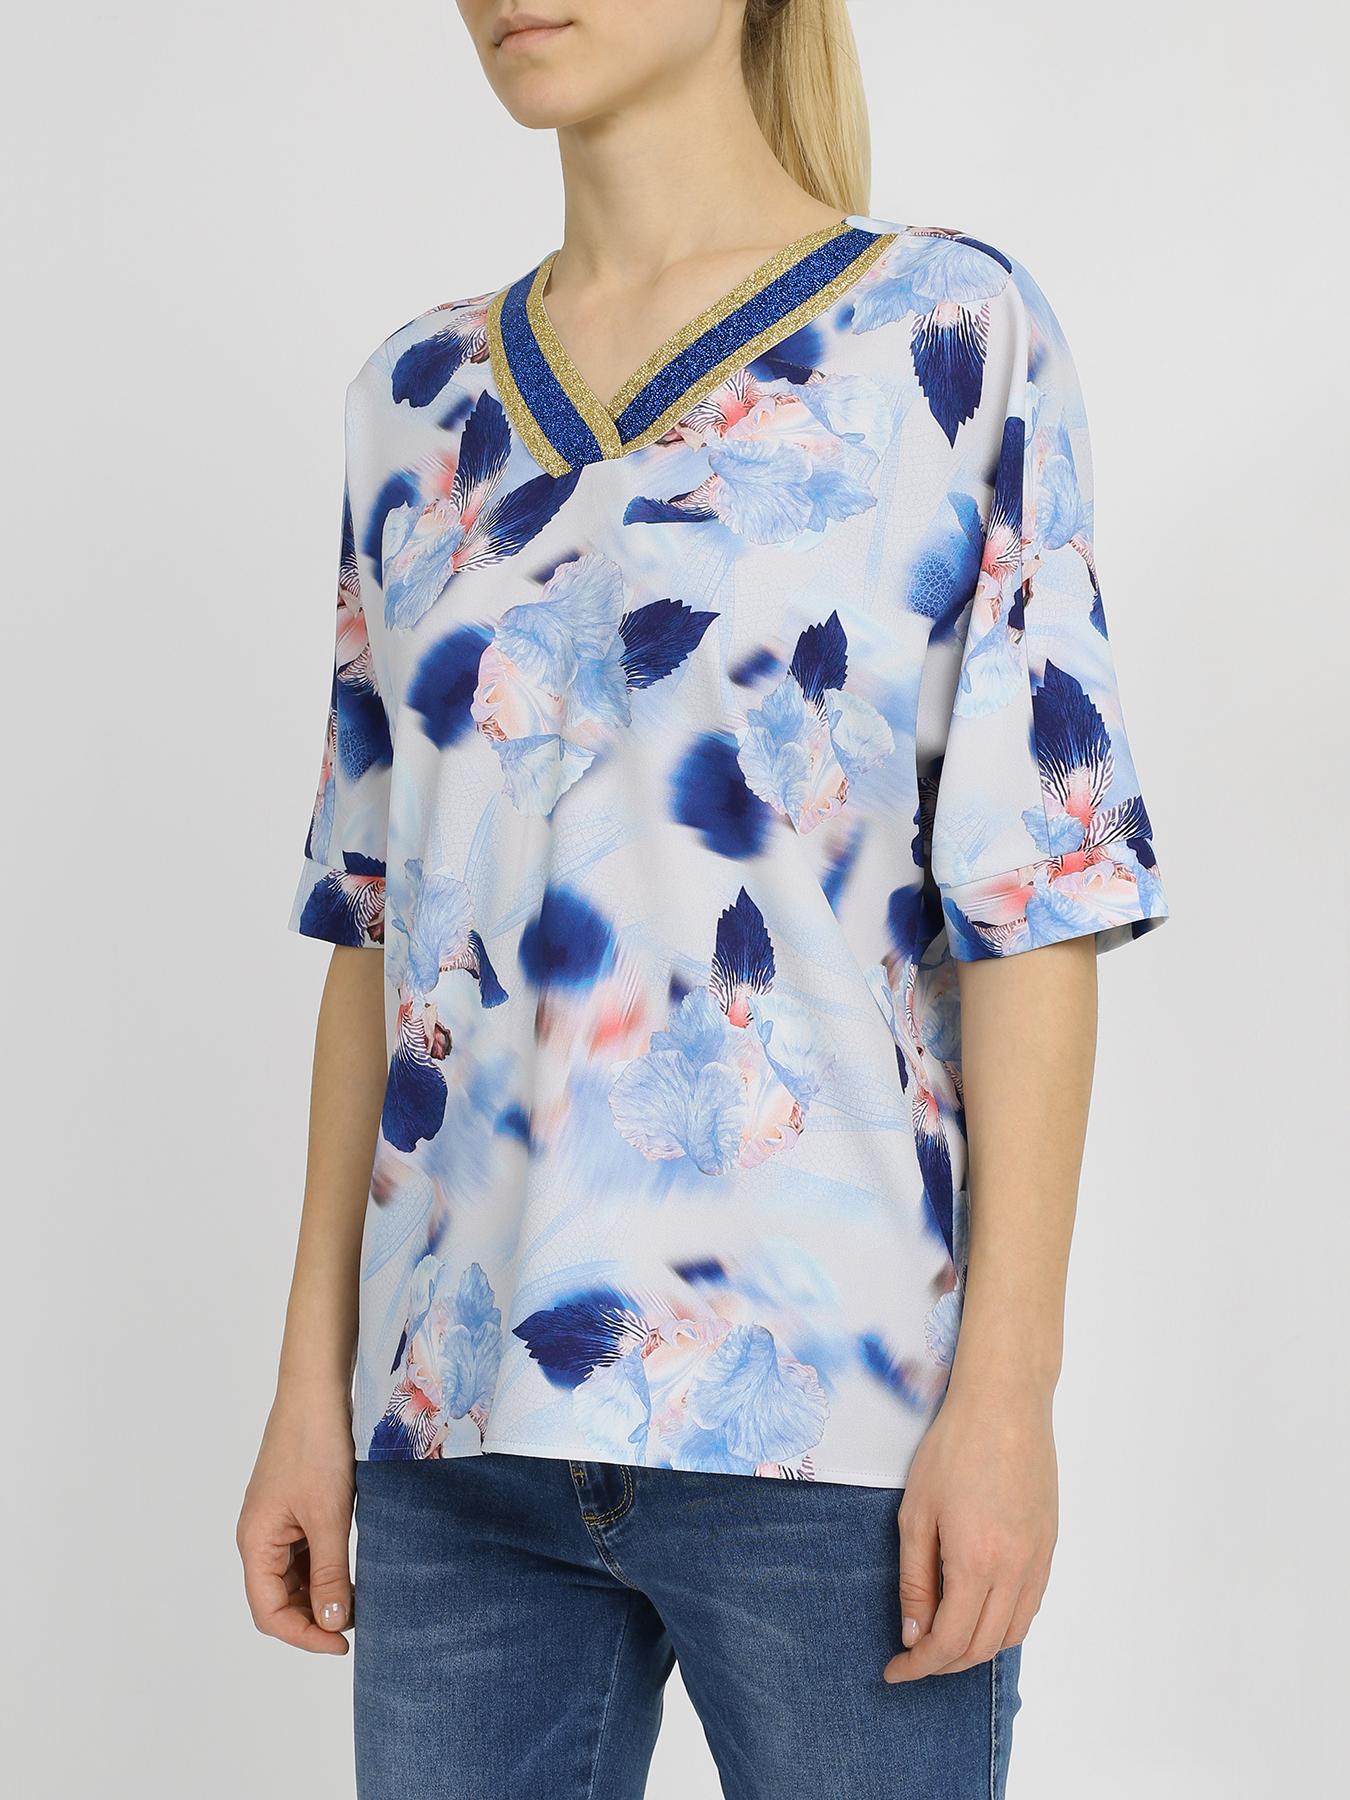 Блузки Korpo Блузка блузка helmidge блузка